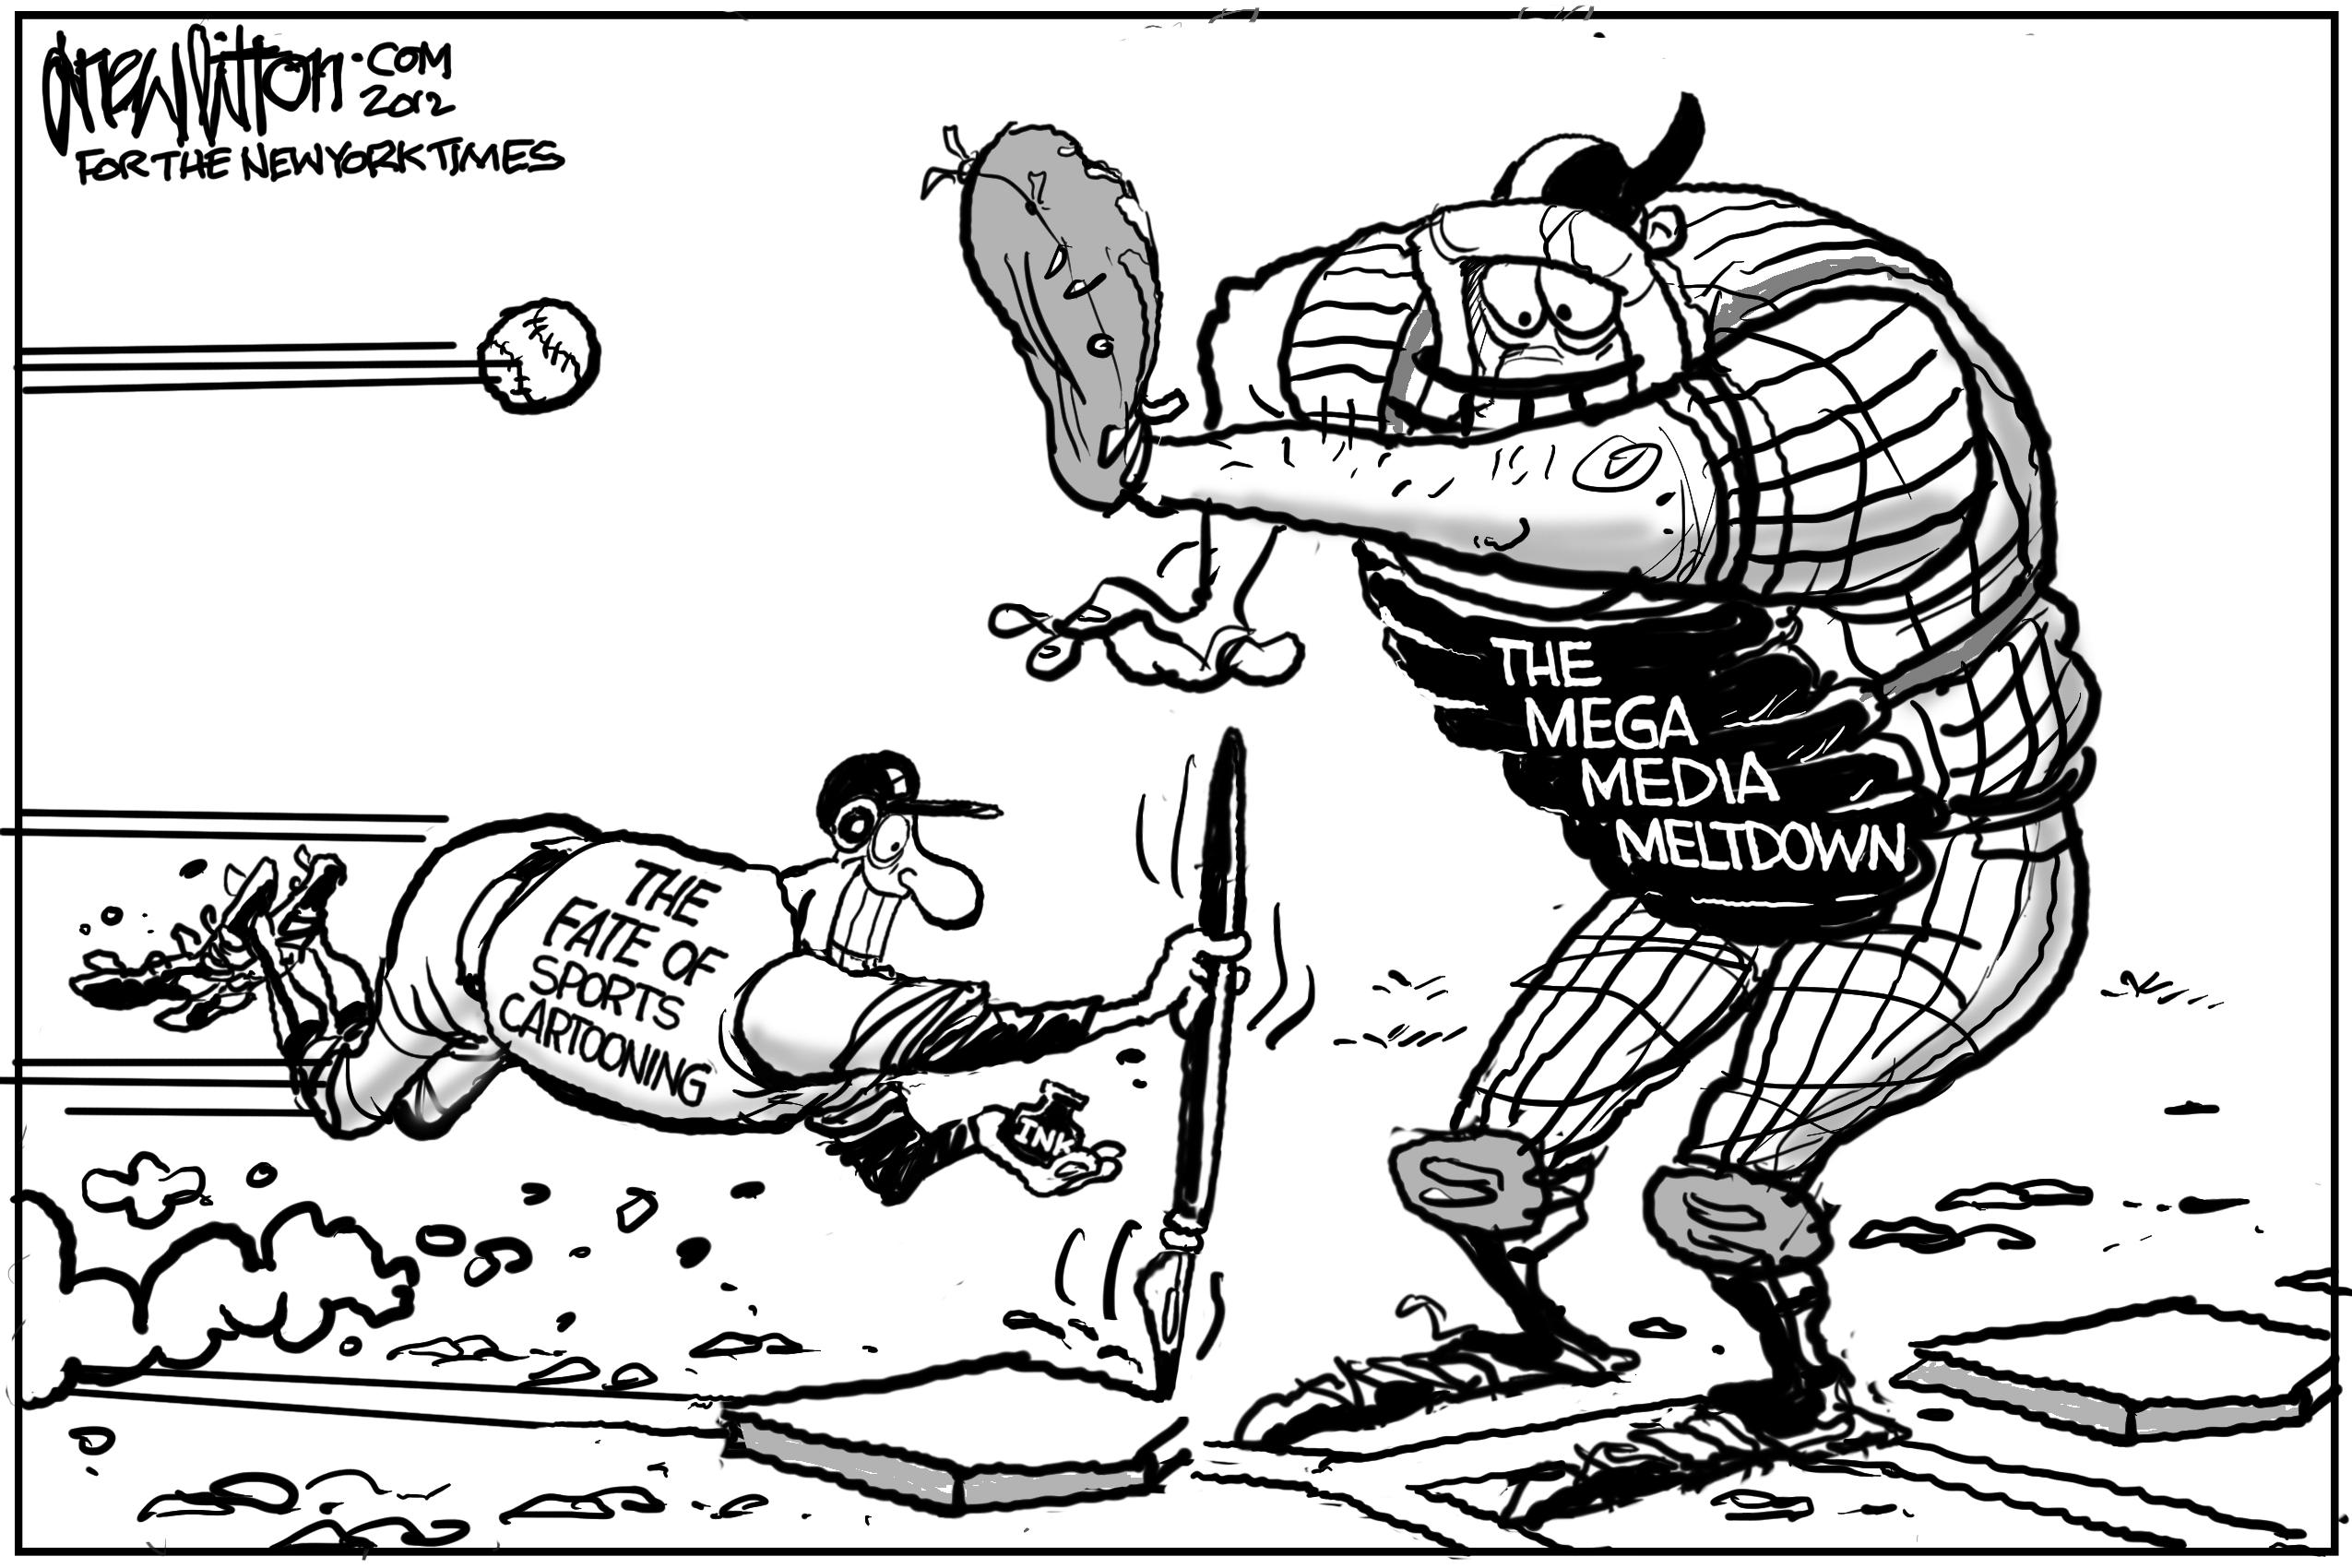 New York Times Sports Cartoon Article